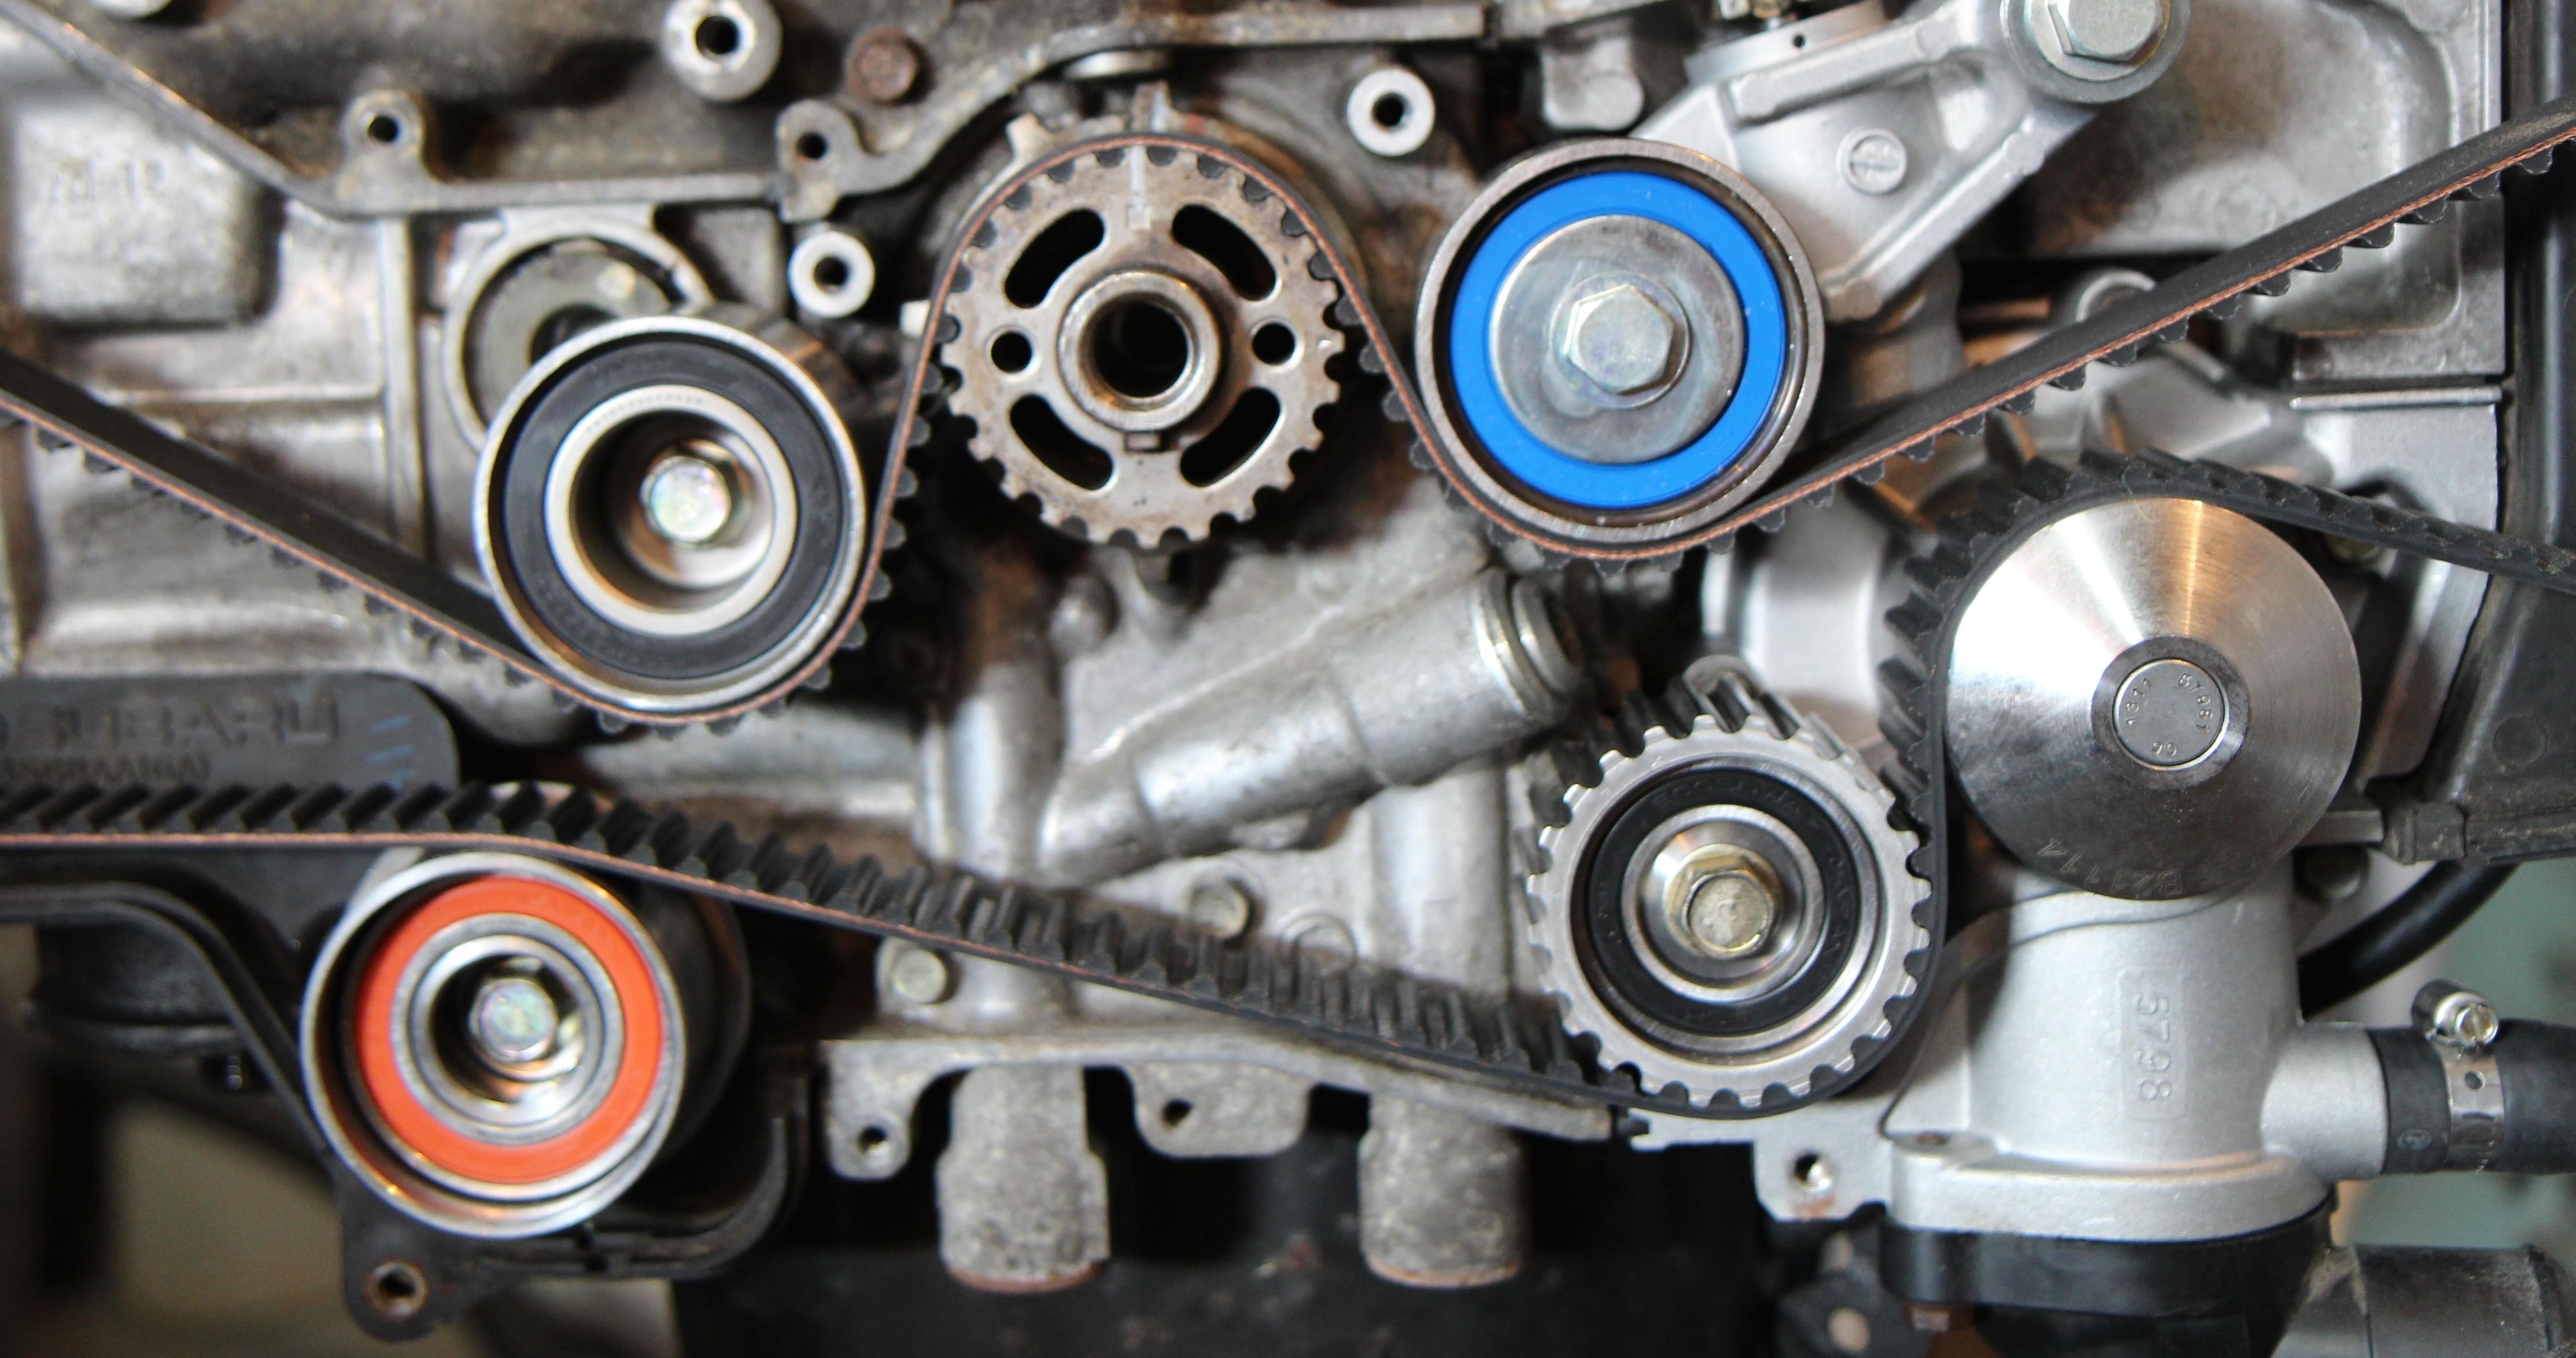 Subaru 2 5 Engine Diagram How to Set Timing Timing Belt Change On A Subaru sohc Ej25 Of Subaru 2 5 Engine Diagram